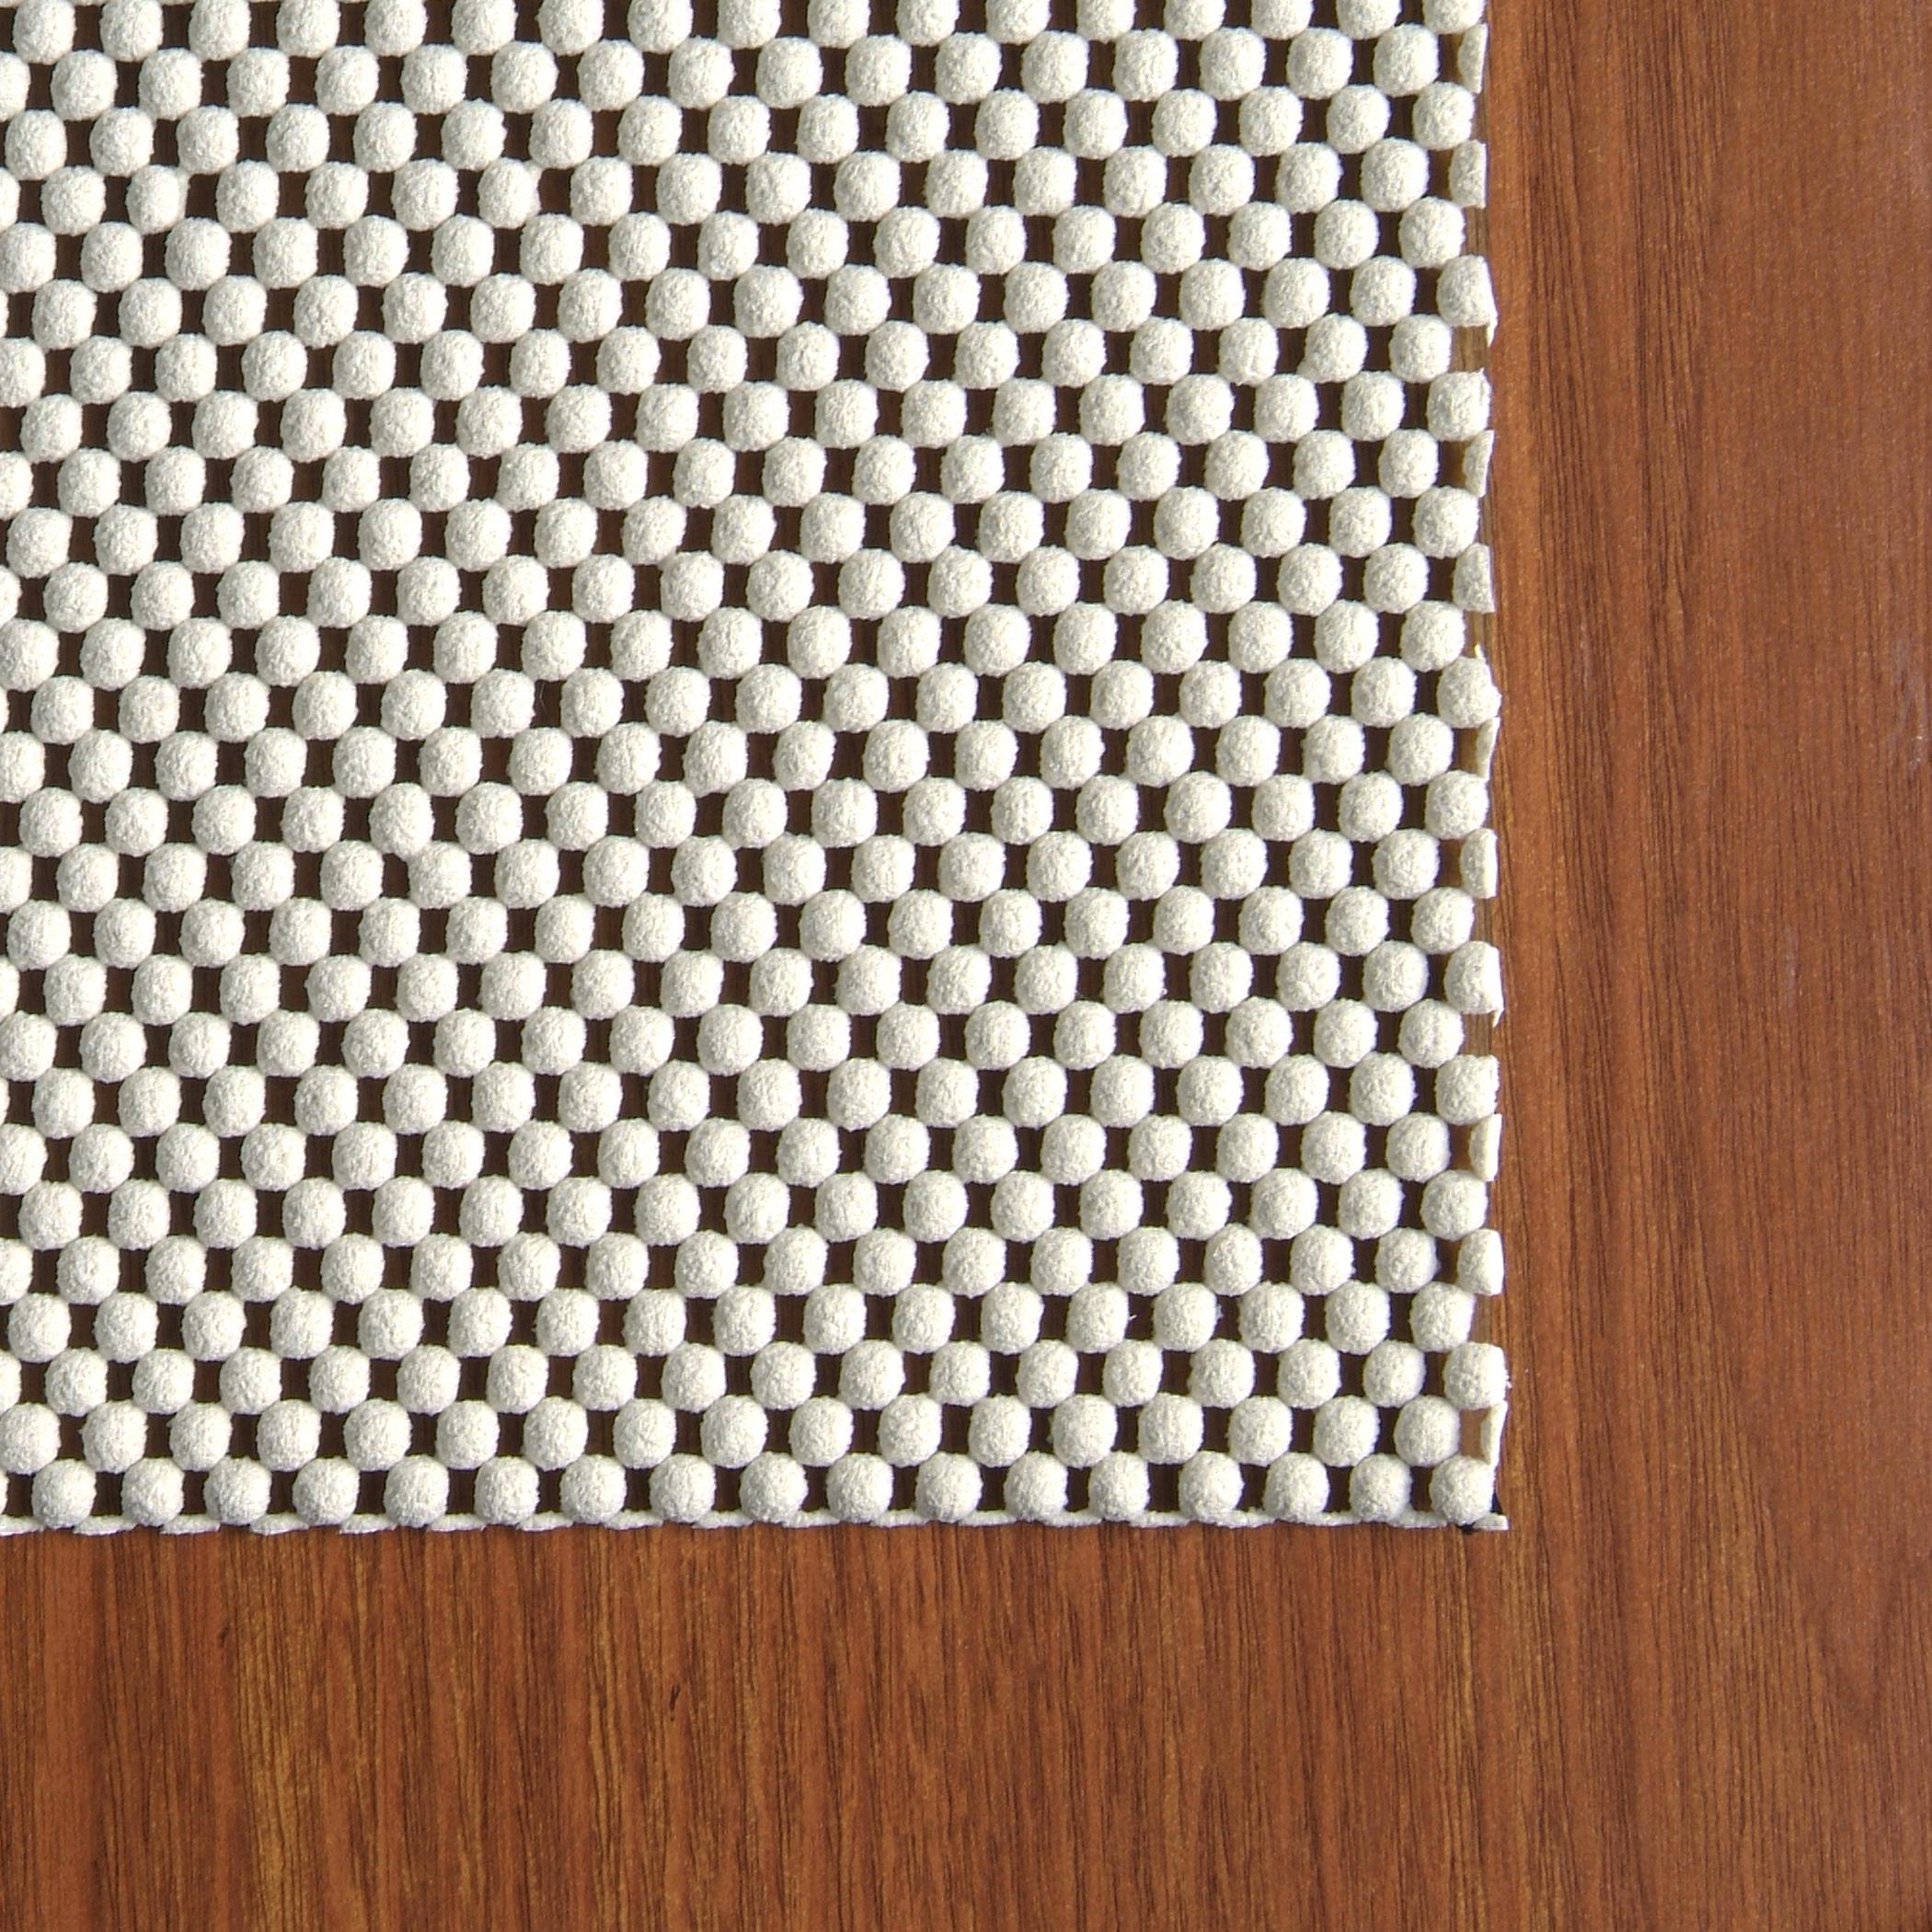 Amazon.com: Con-Tact Rug Pad 8x10, Non-Slip Area Rug Pad